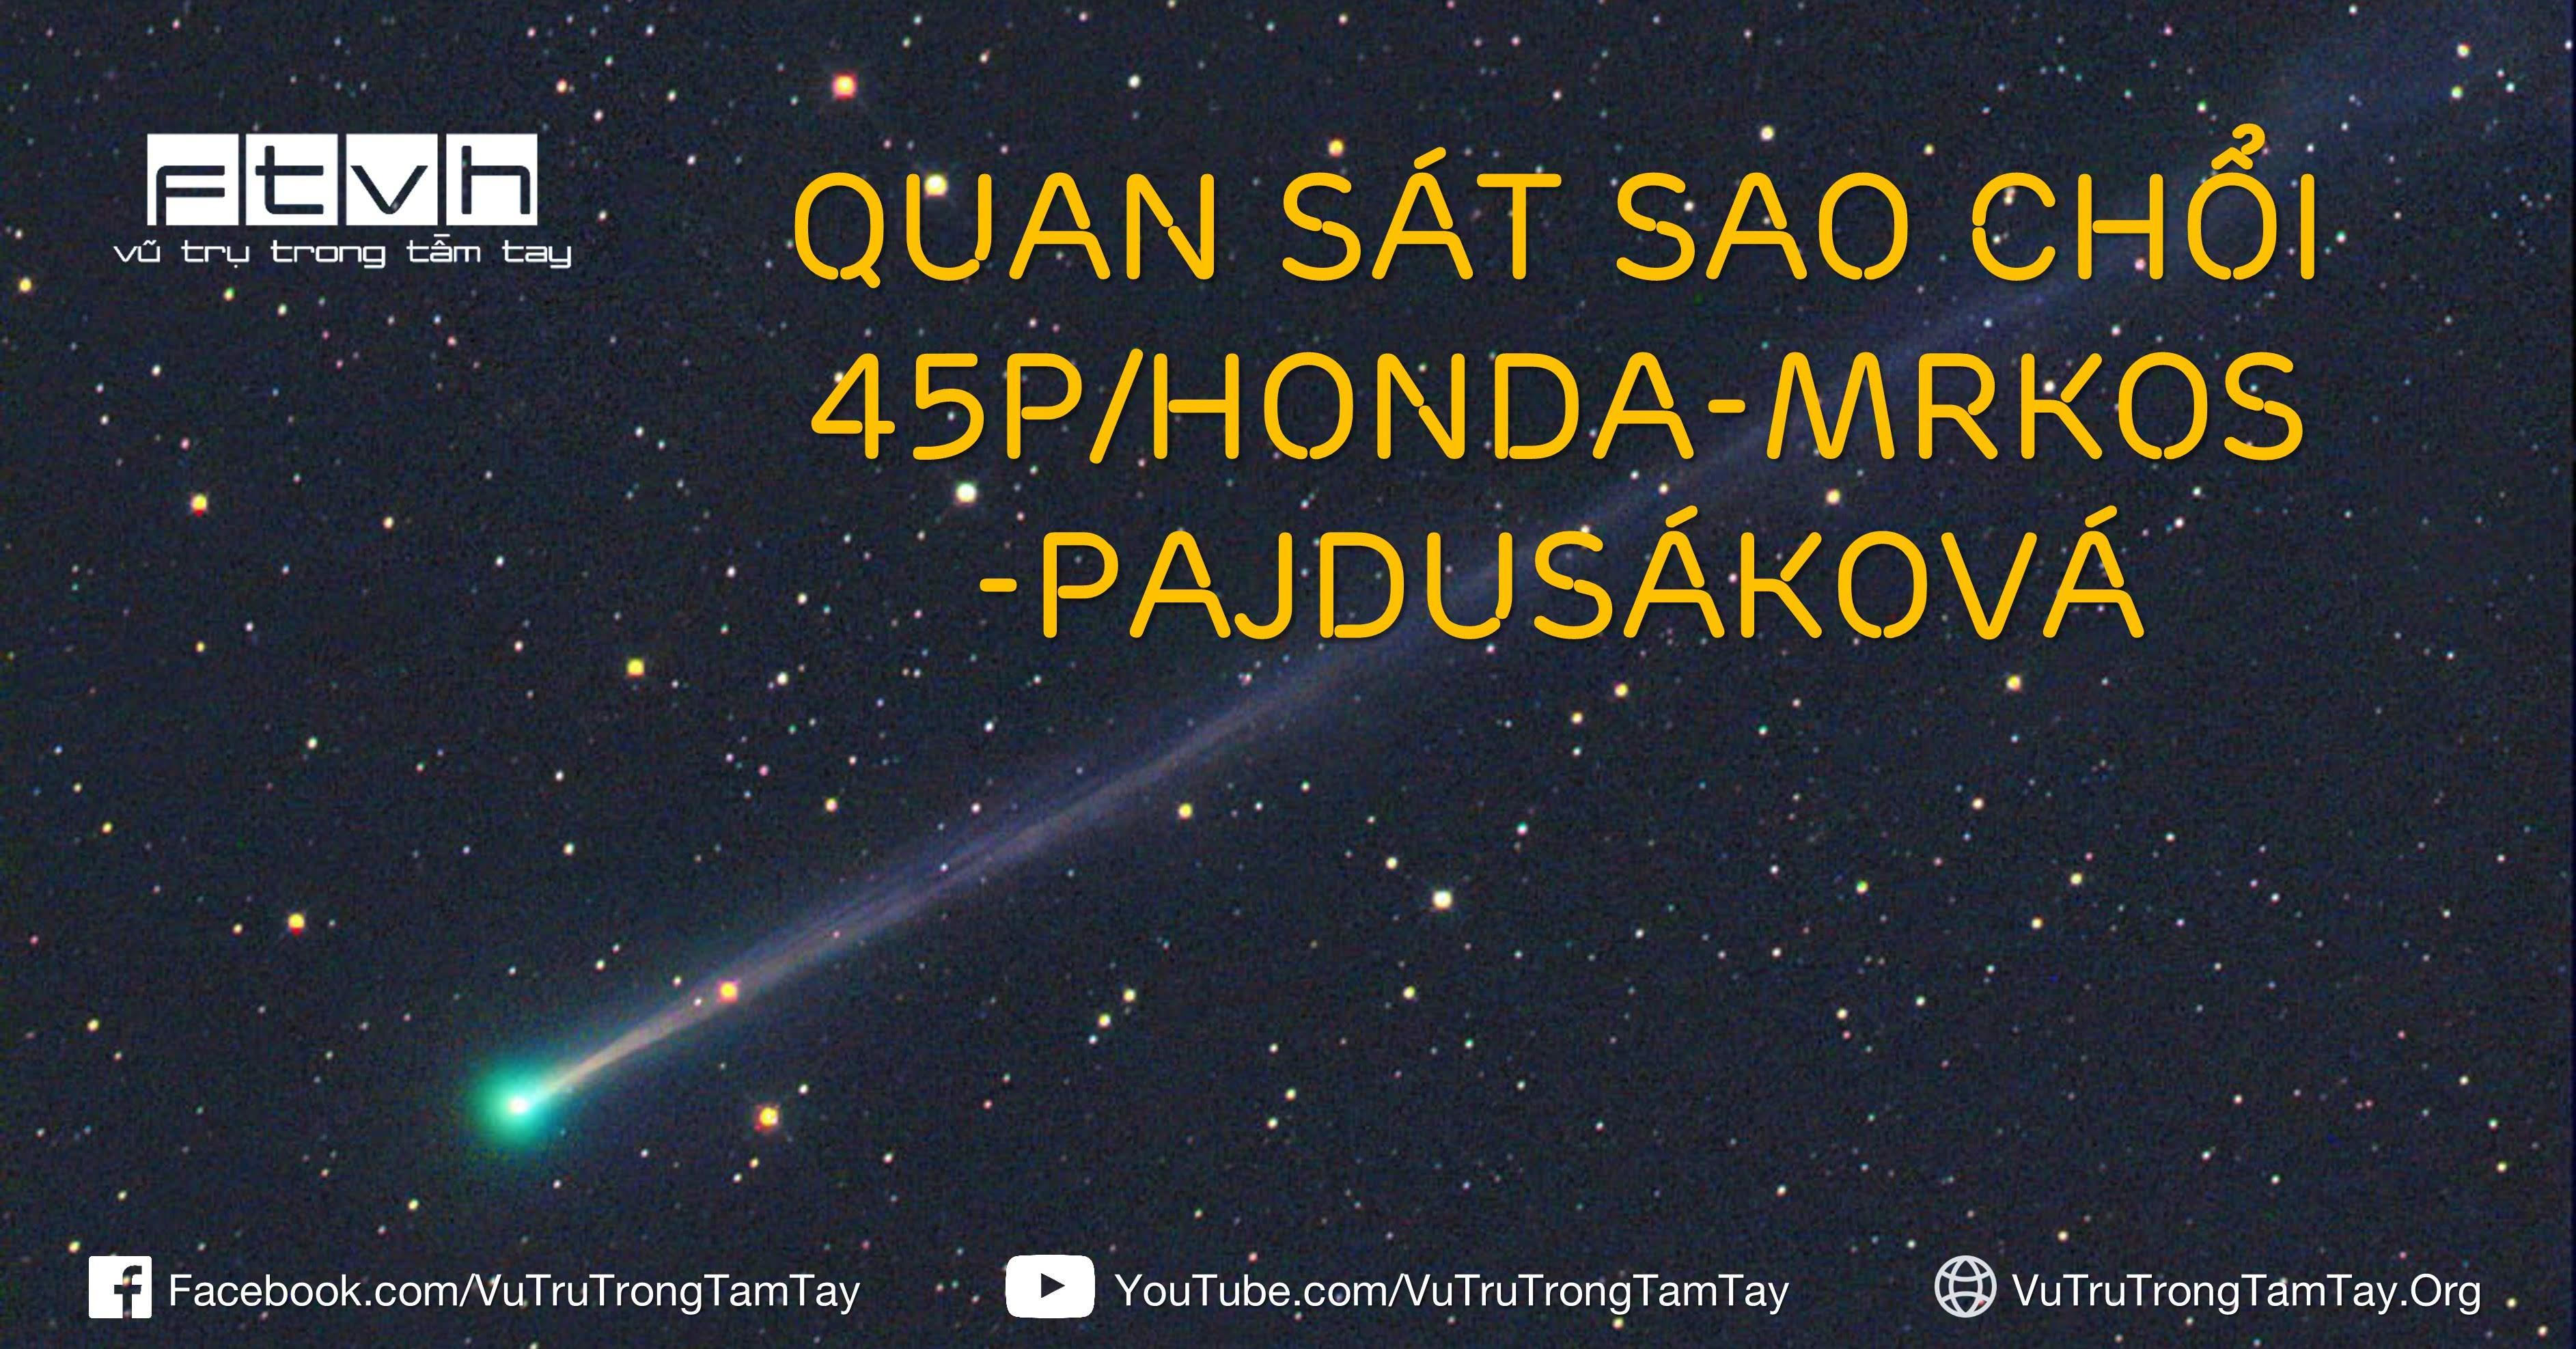 Sao chổi 45P/Honda-Mrkos-Pajdušáková chụp bởi Tim Puckett